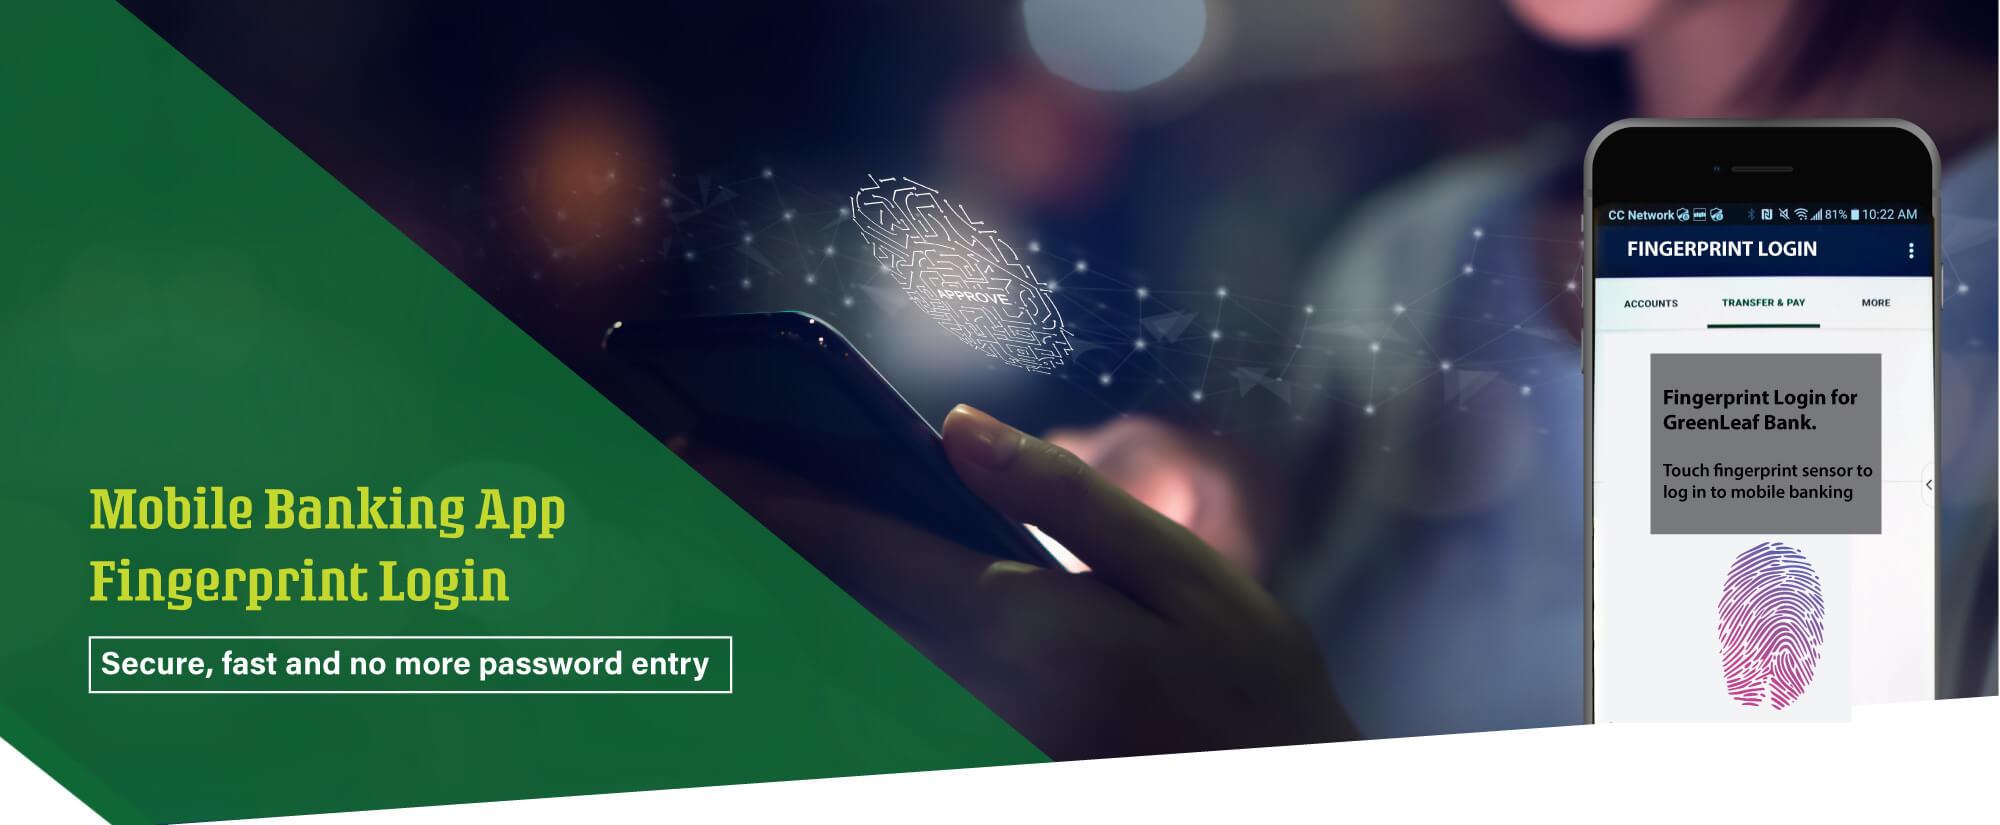 Fast, Secure and No More Password. Mobile App fingerprint login